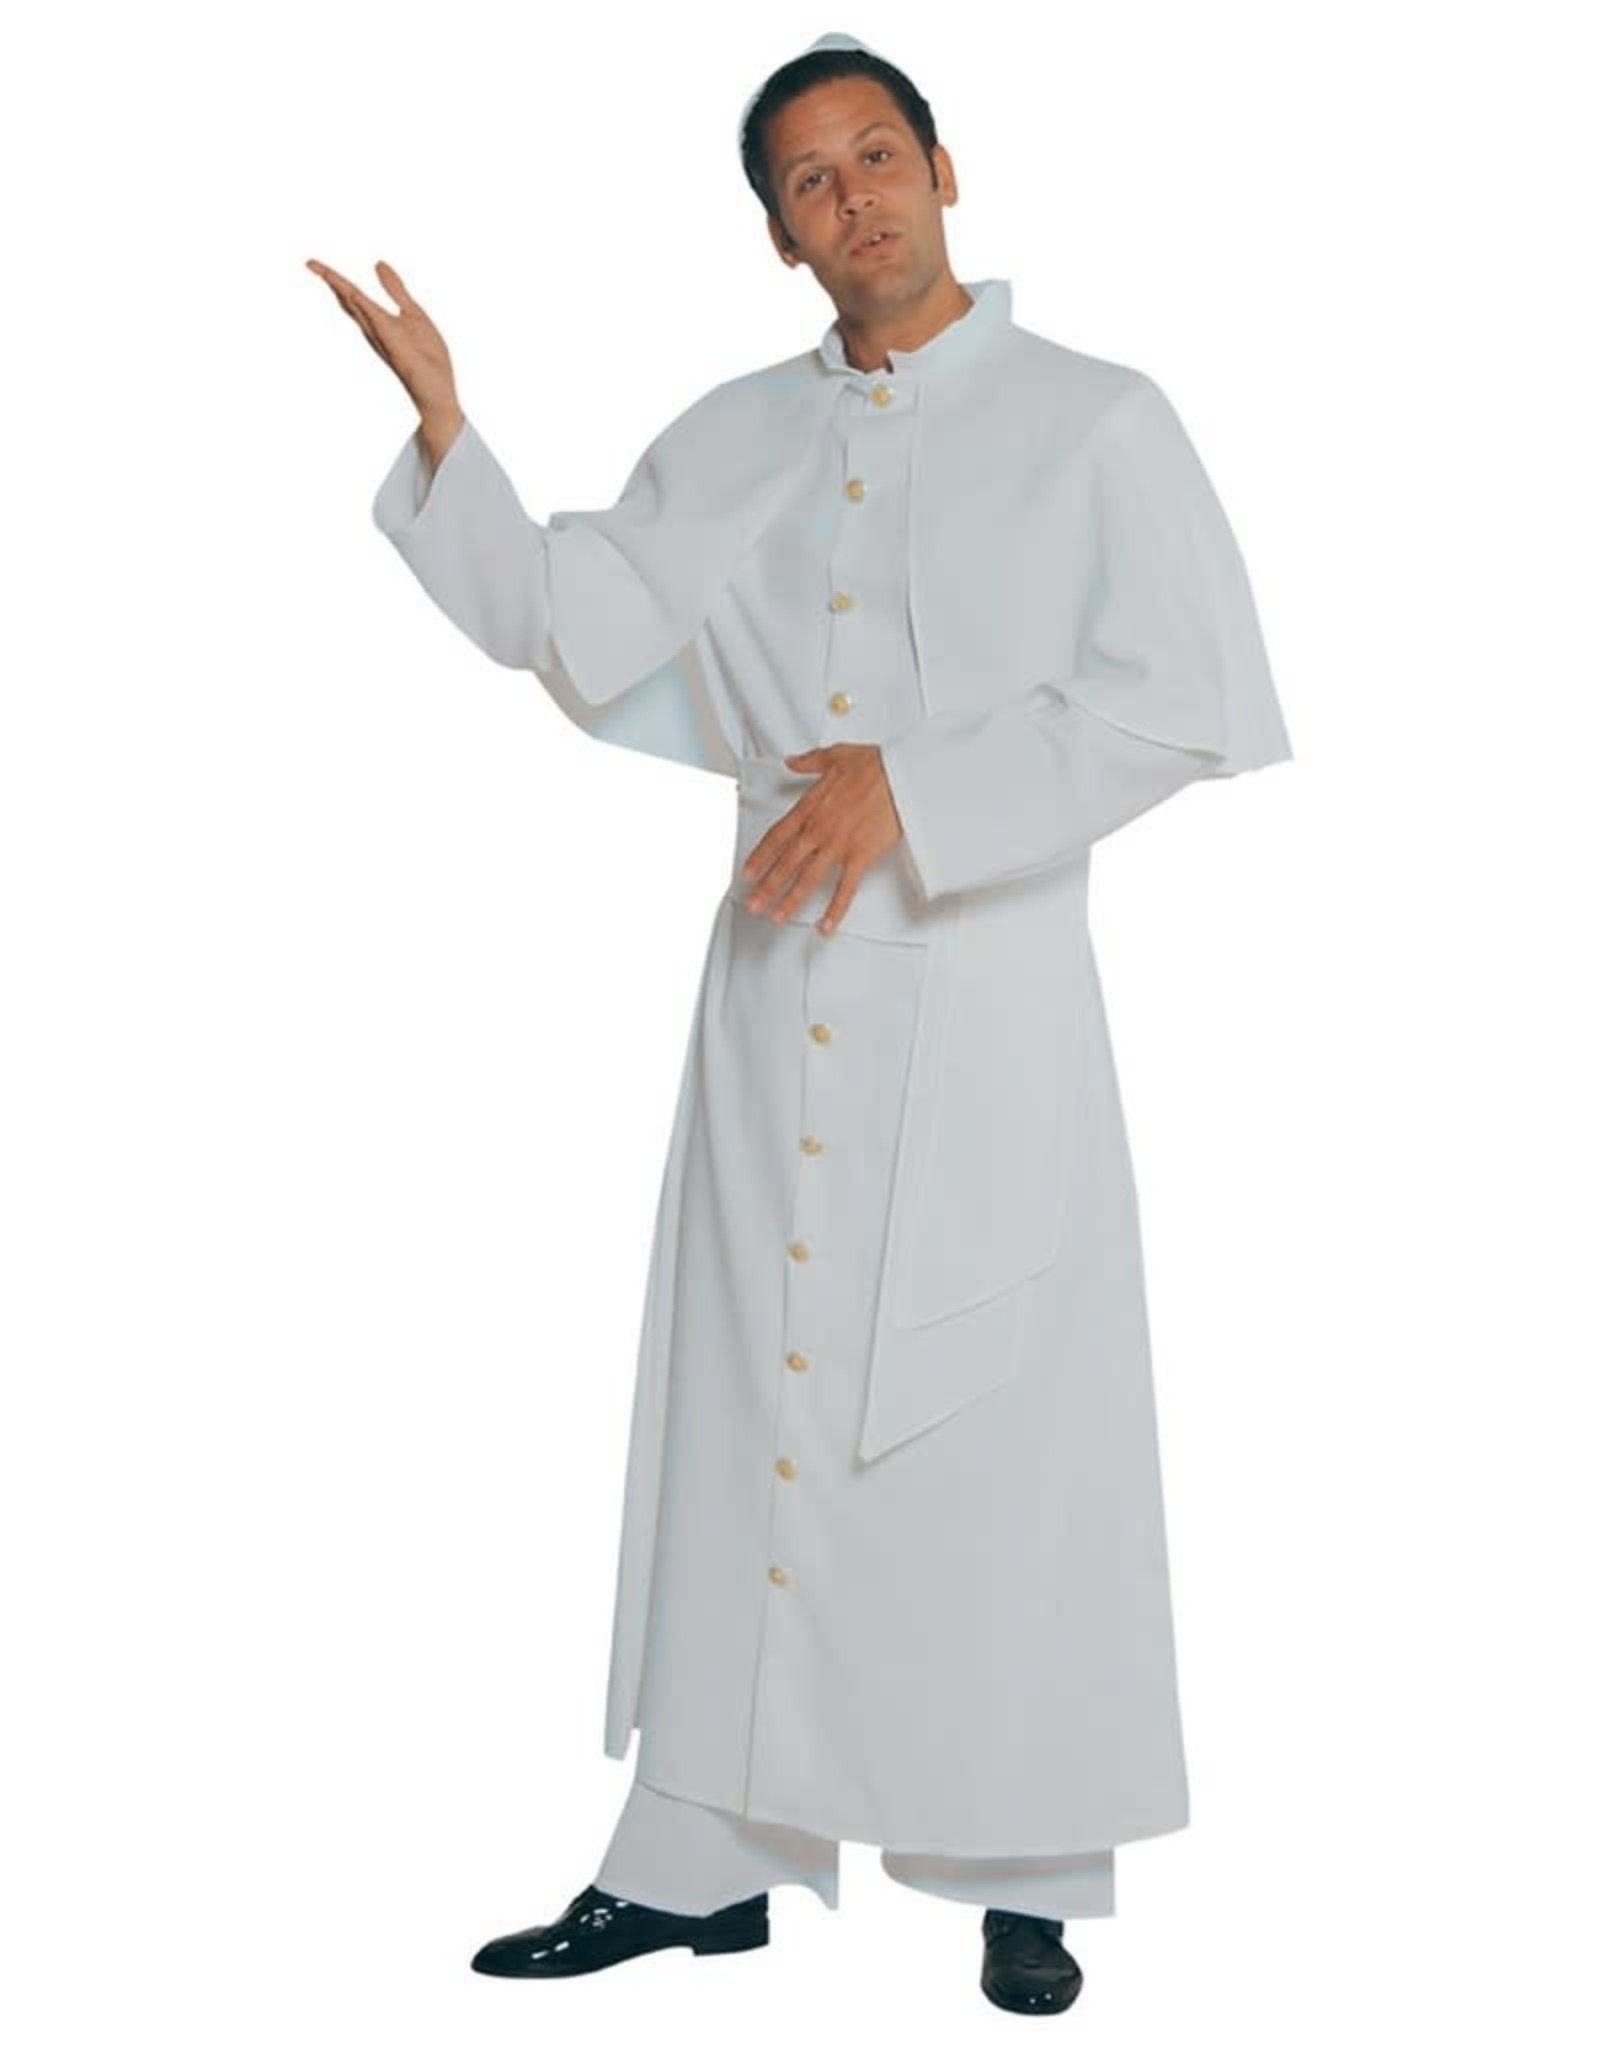 MAGIC kardinaal paus huurprijs 15